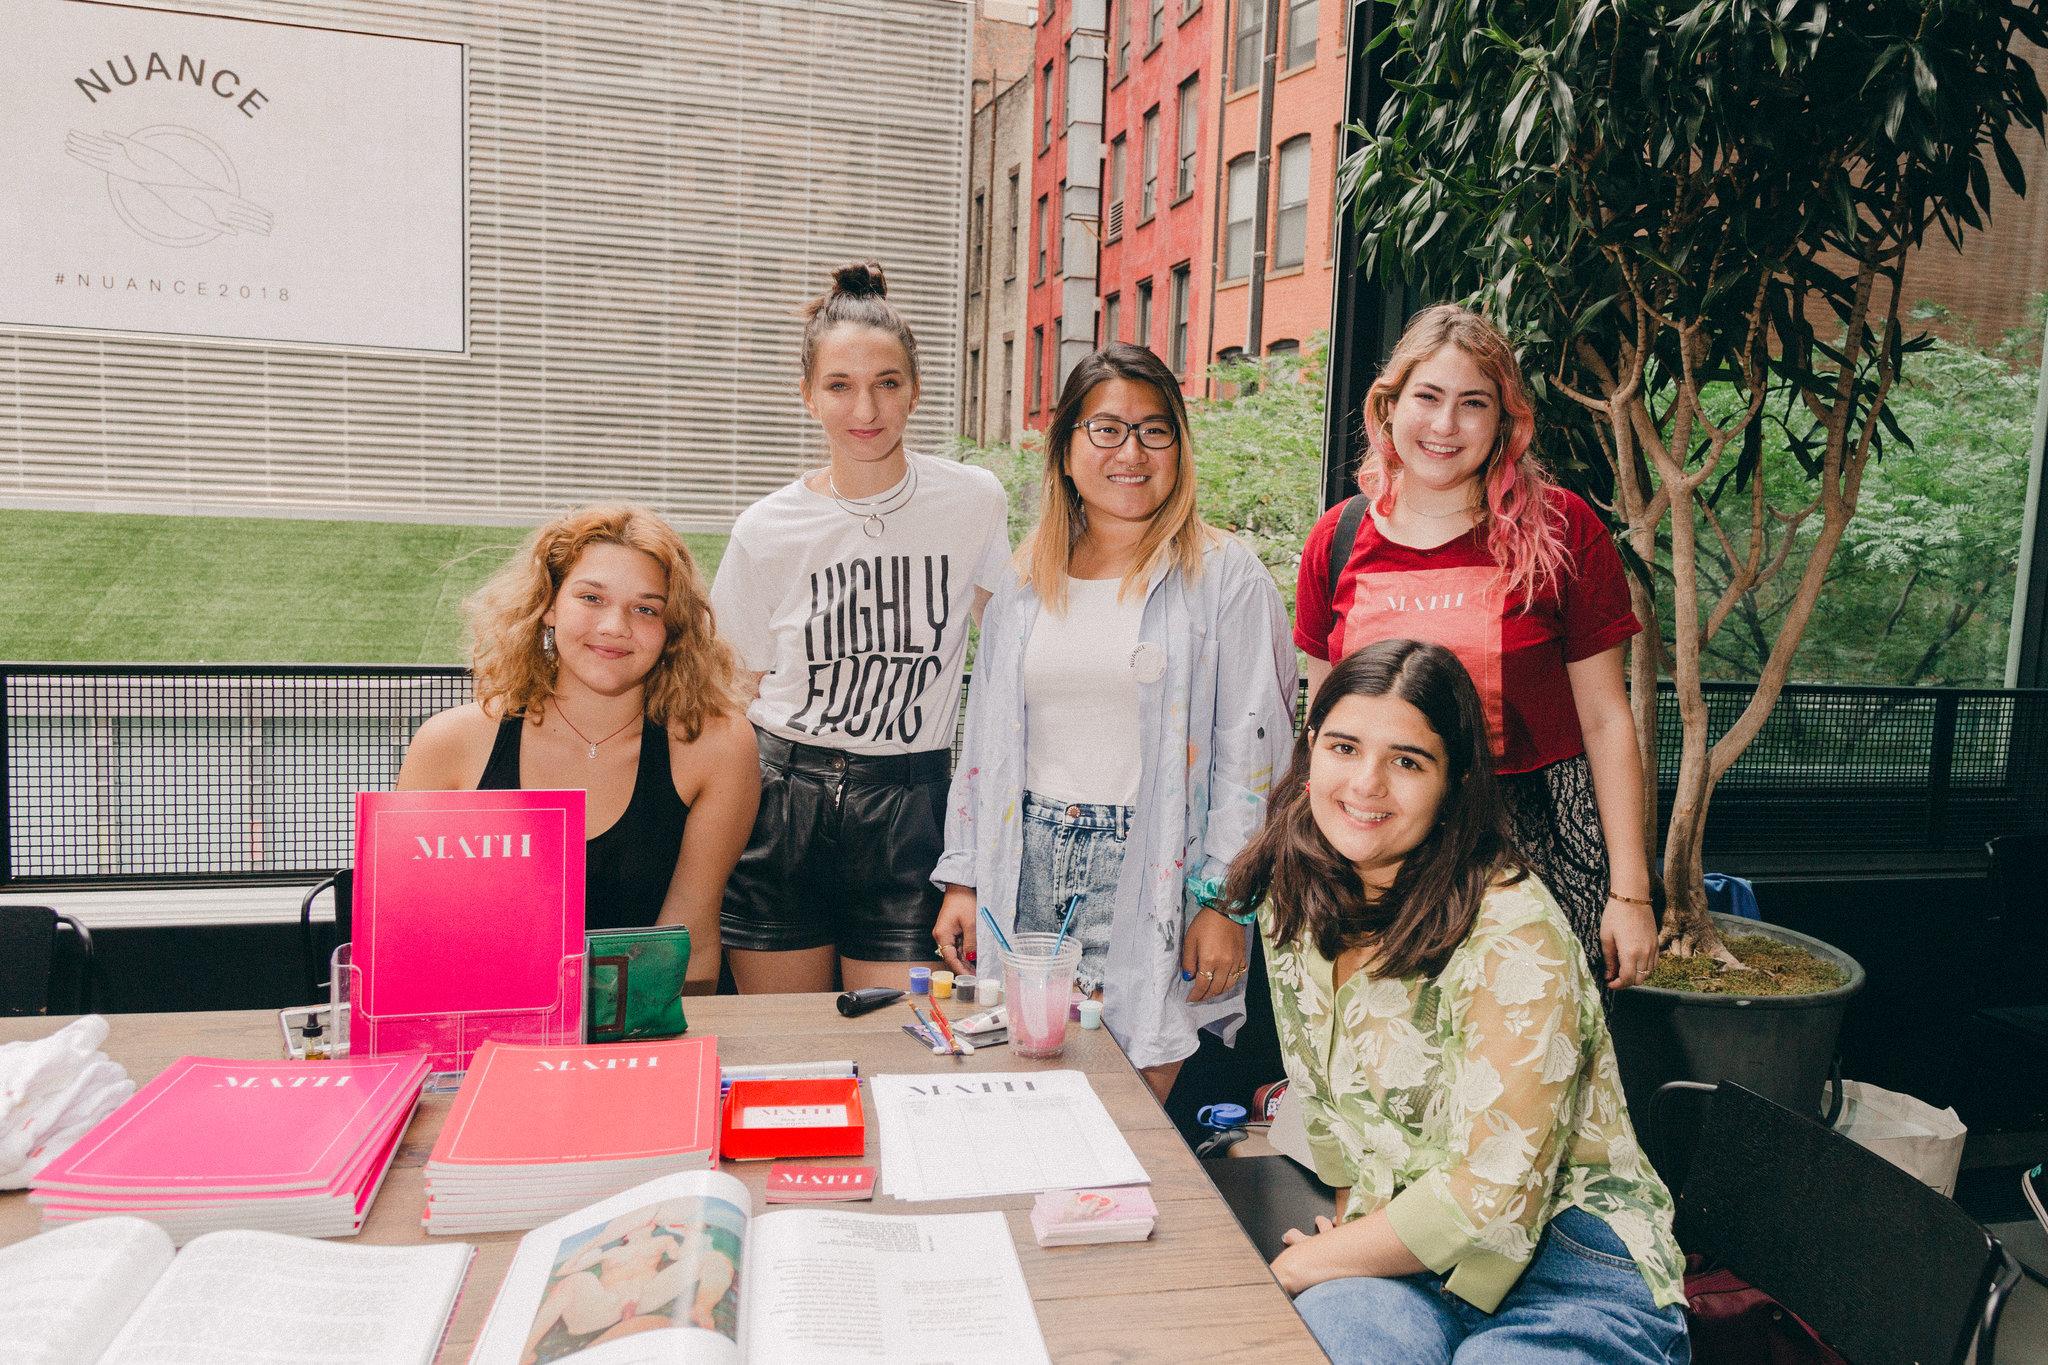 Natalie, MacKenzie, Amy, Ginger, and Gina: the Summer 2018 NYC team